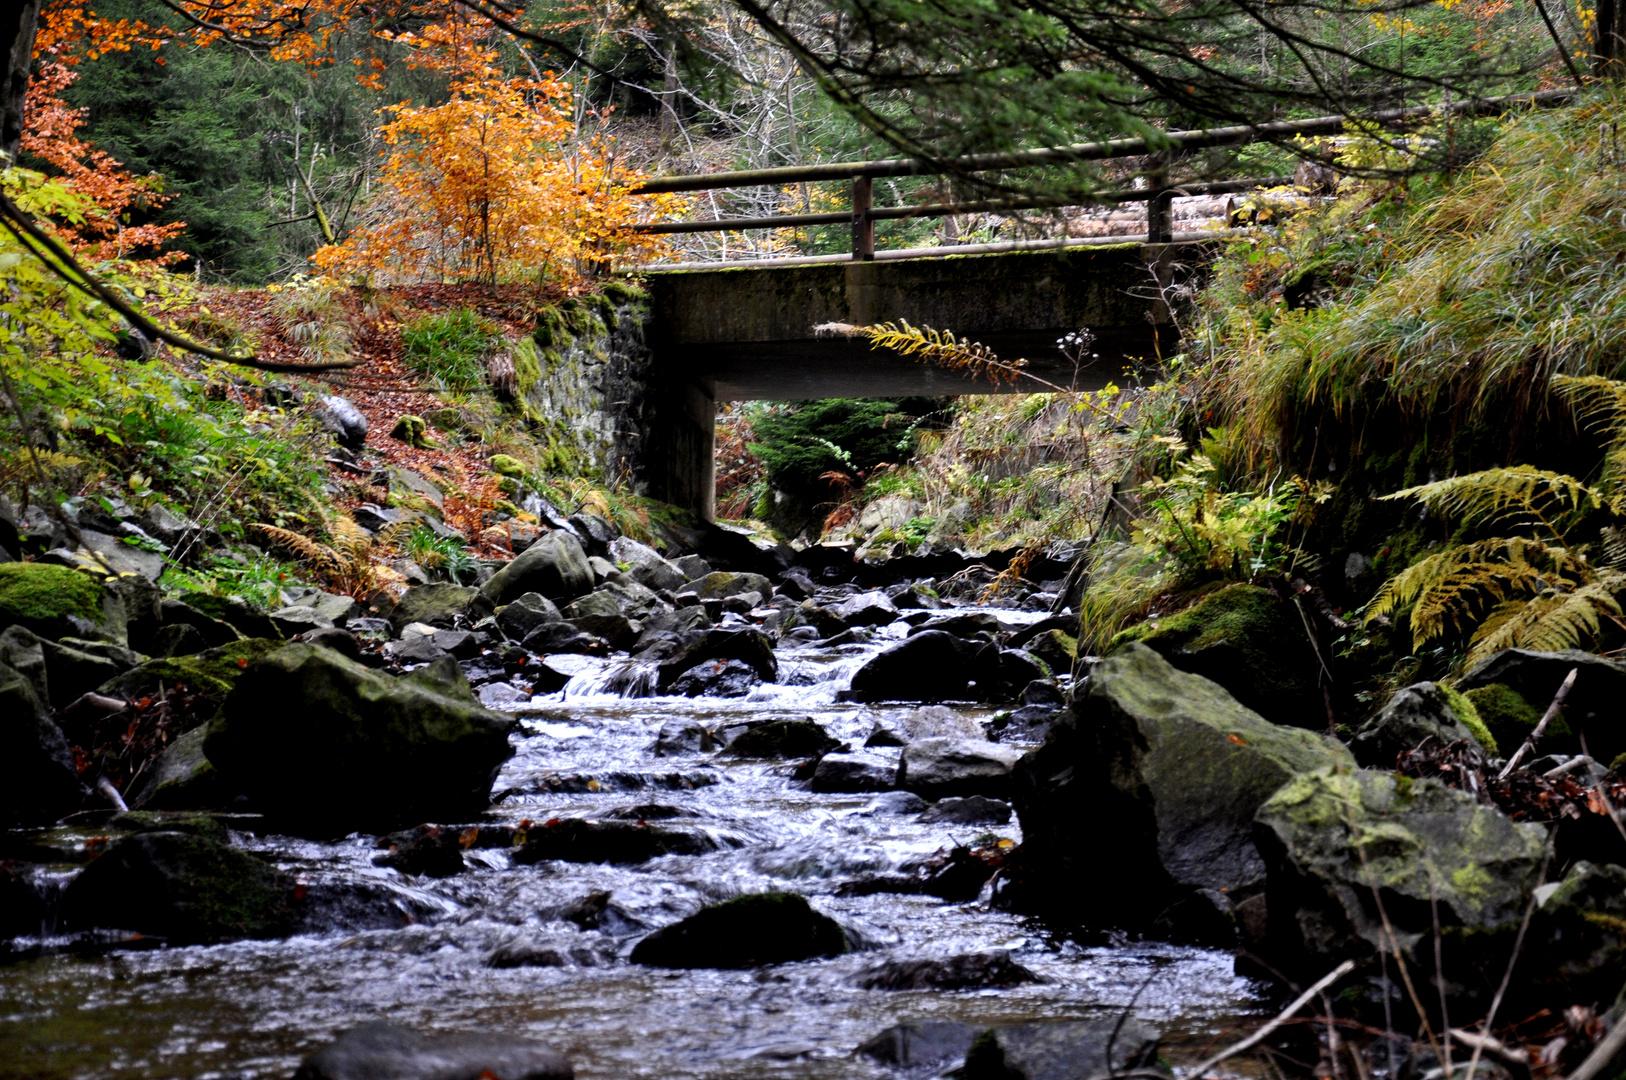 Verzauberte Welt im Harz